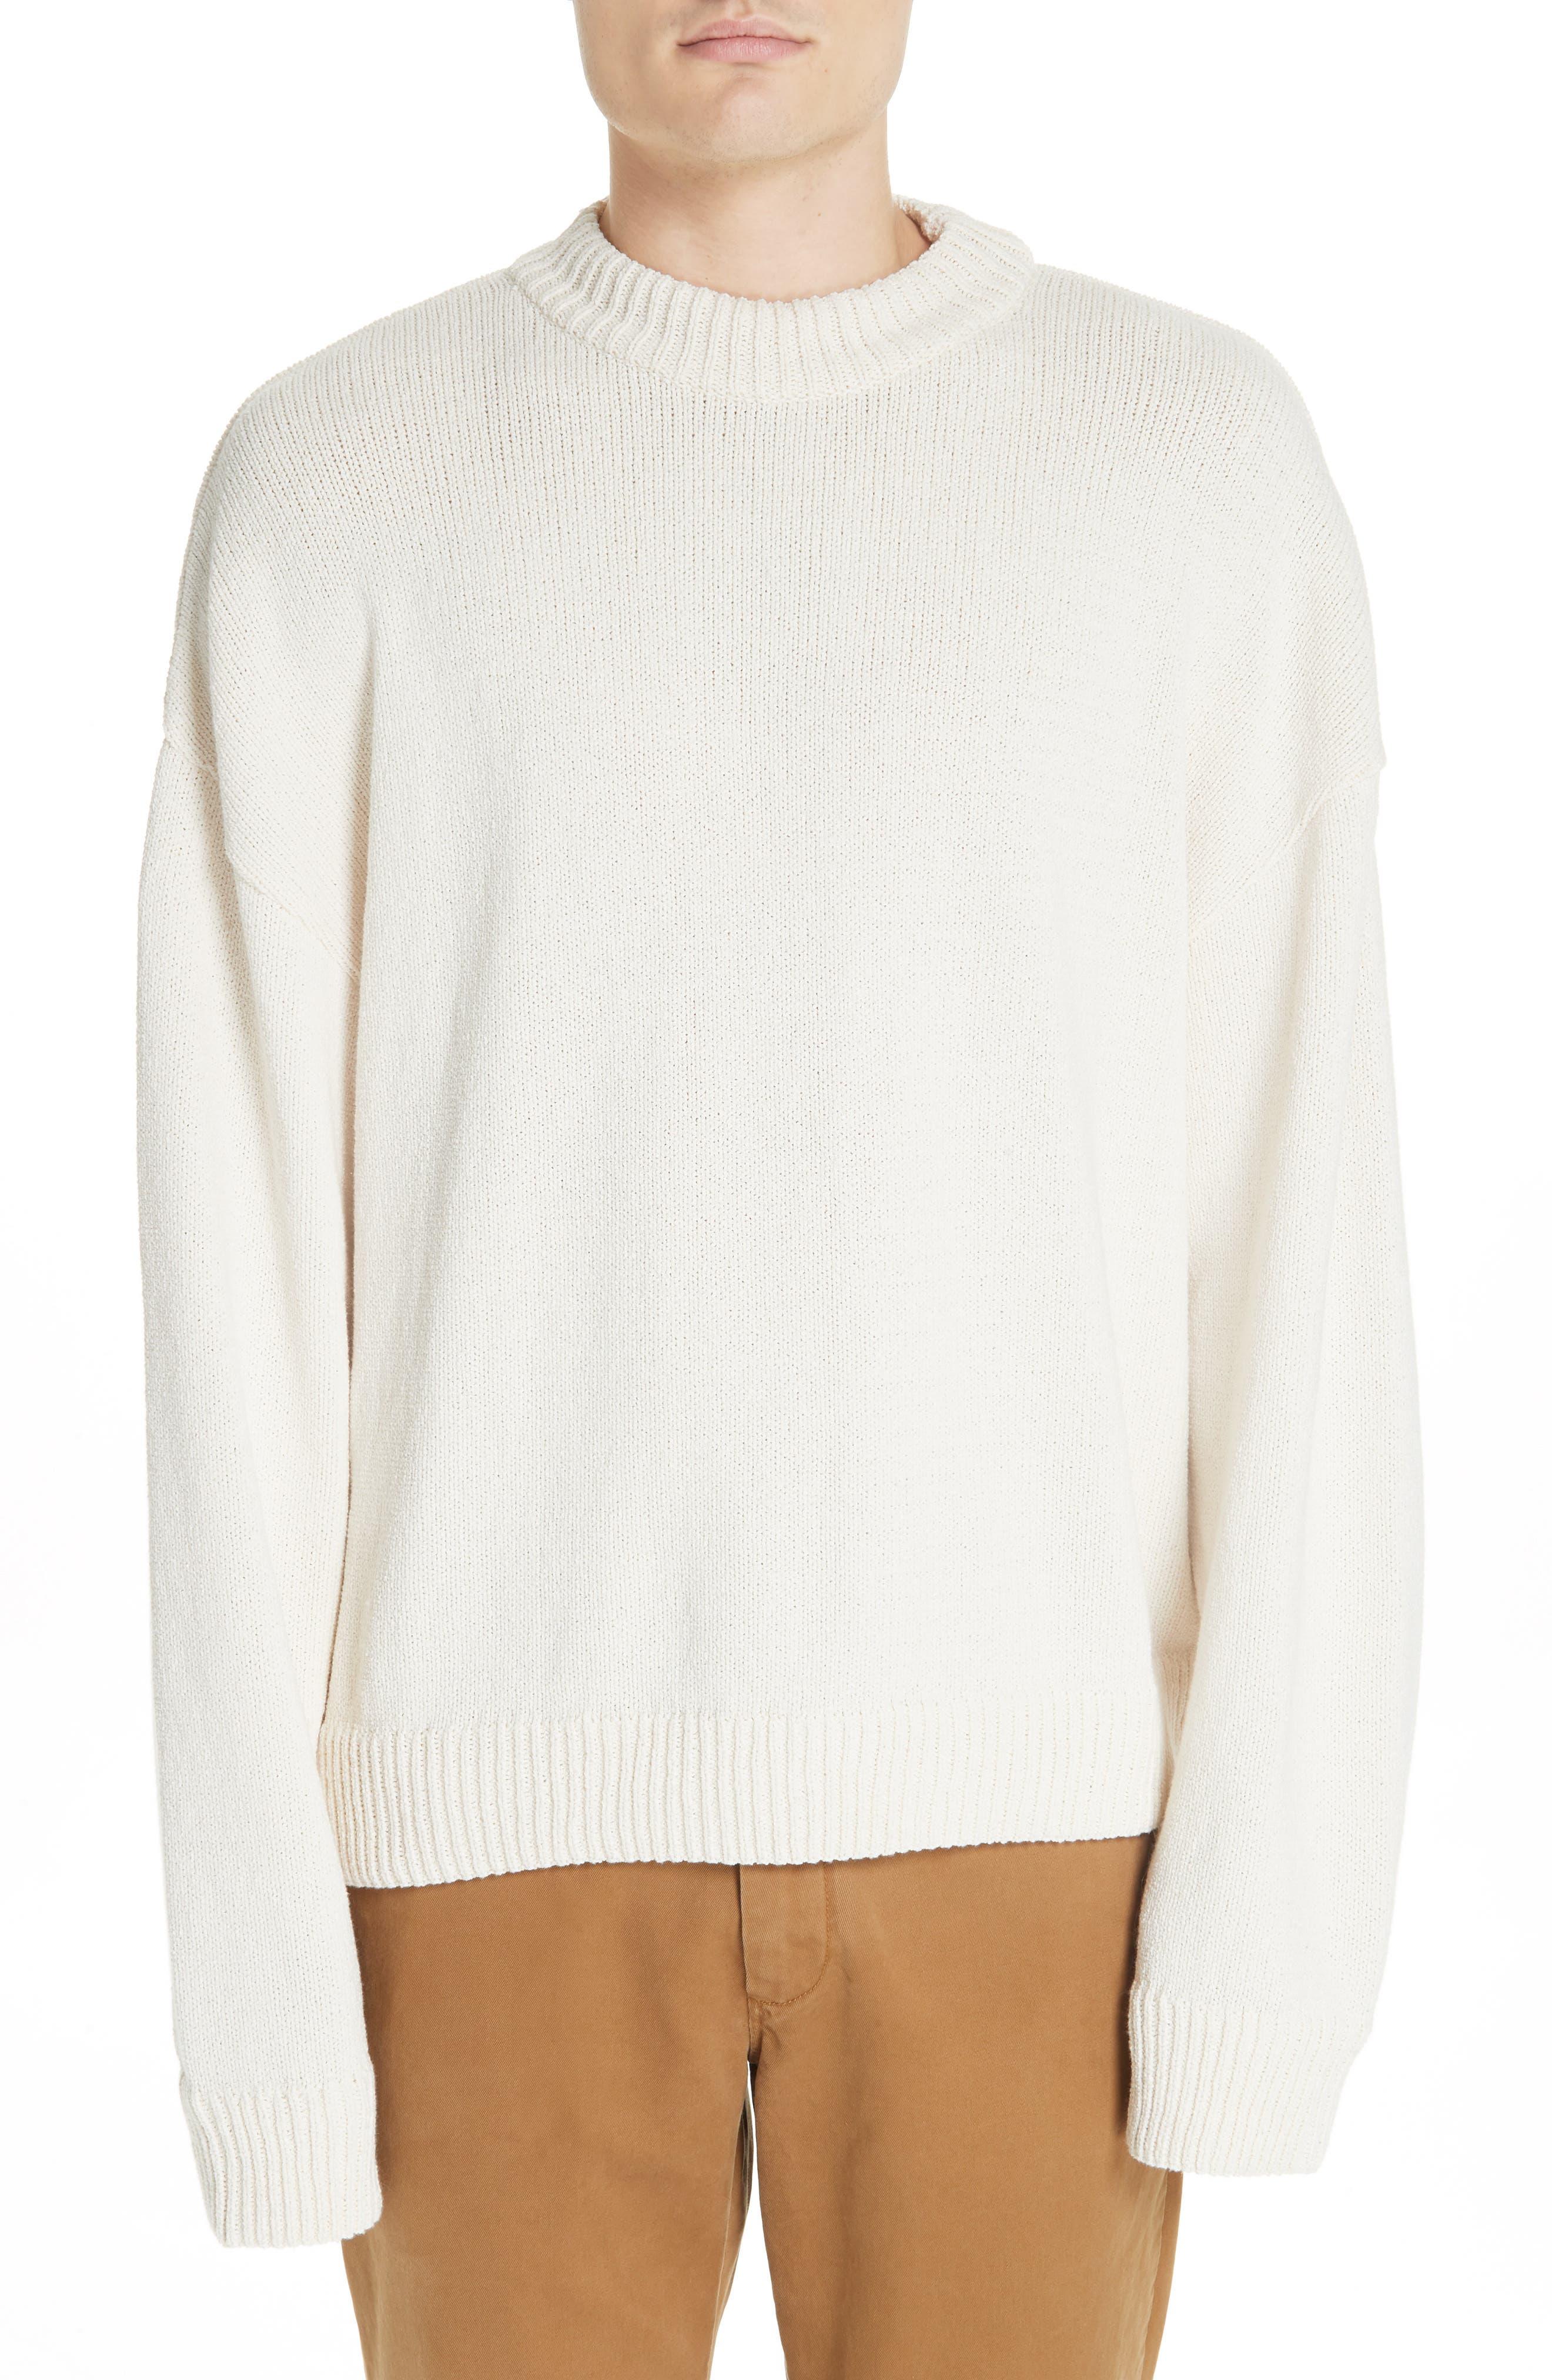 Somar Oversized Crewneck Sweater,                         Main,                         color, 100